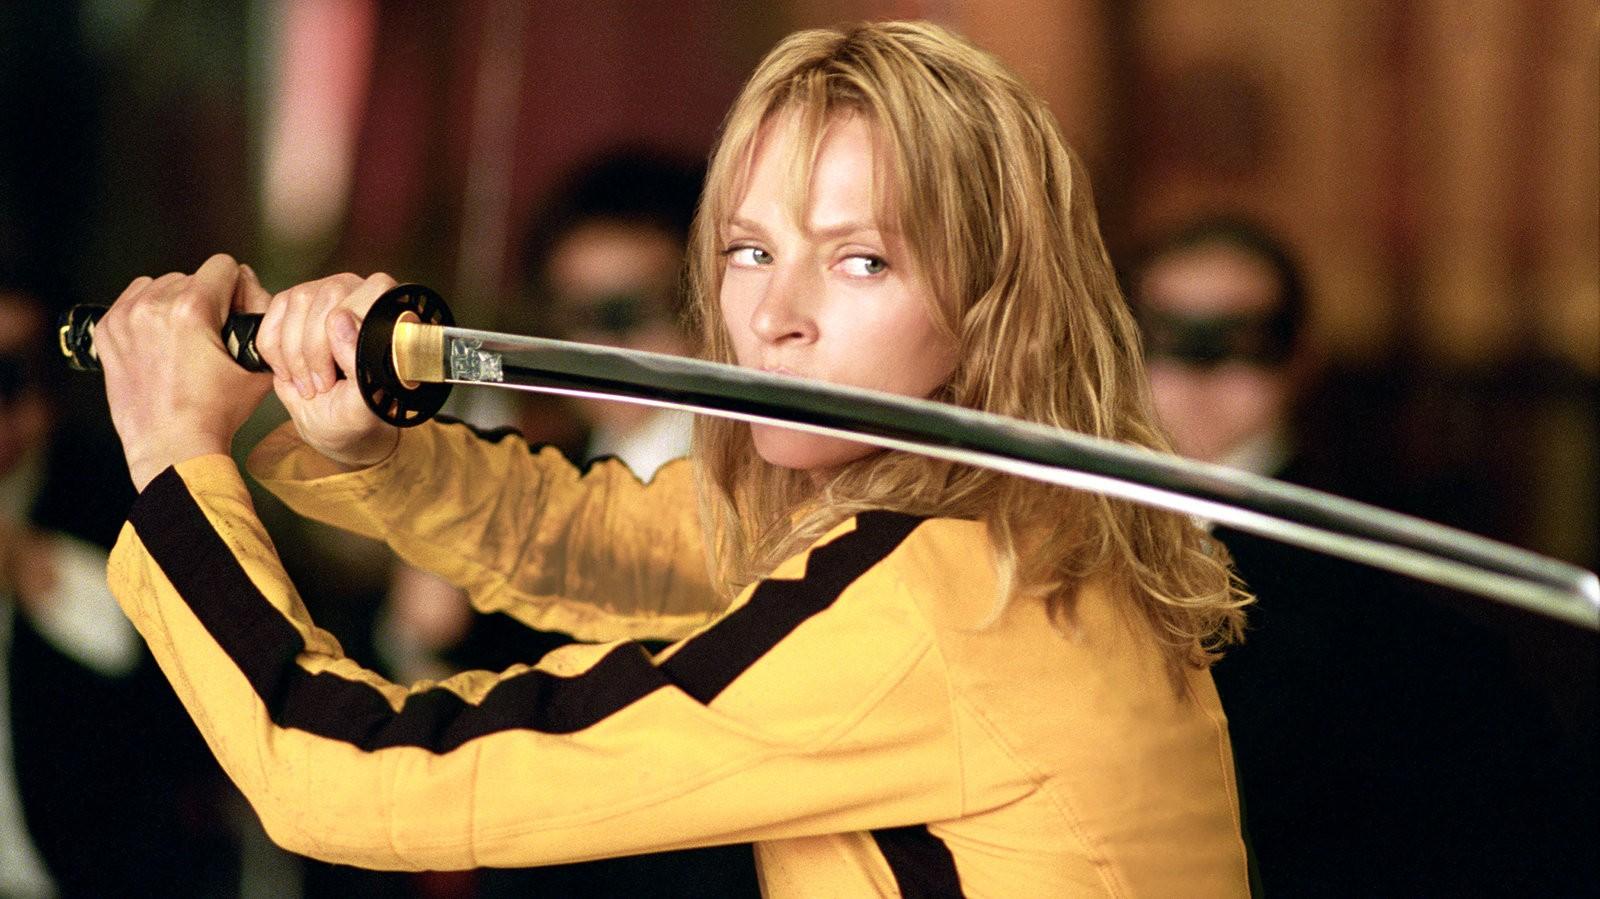 Sharpen your Japanese steel for midnight screenings of 'Kill Bill Vol. 1' | The Scene